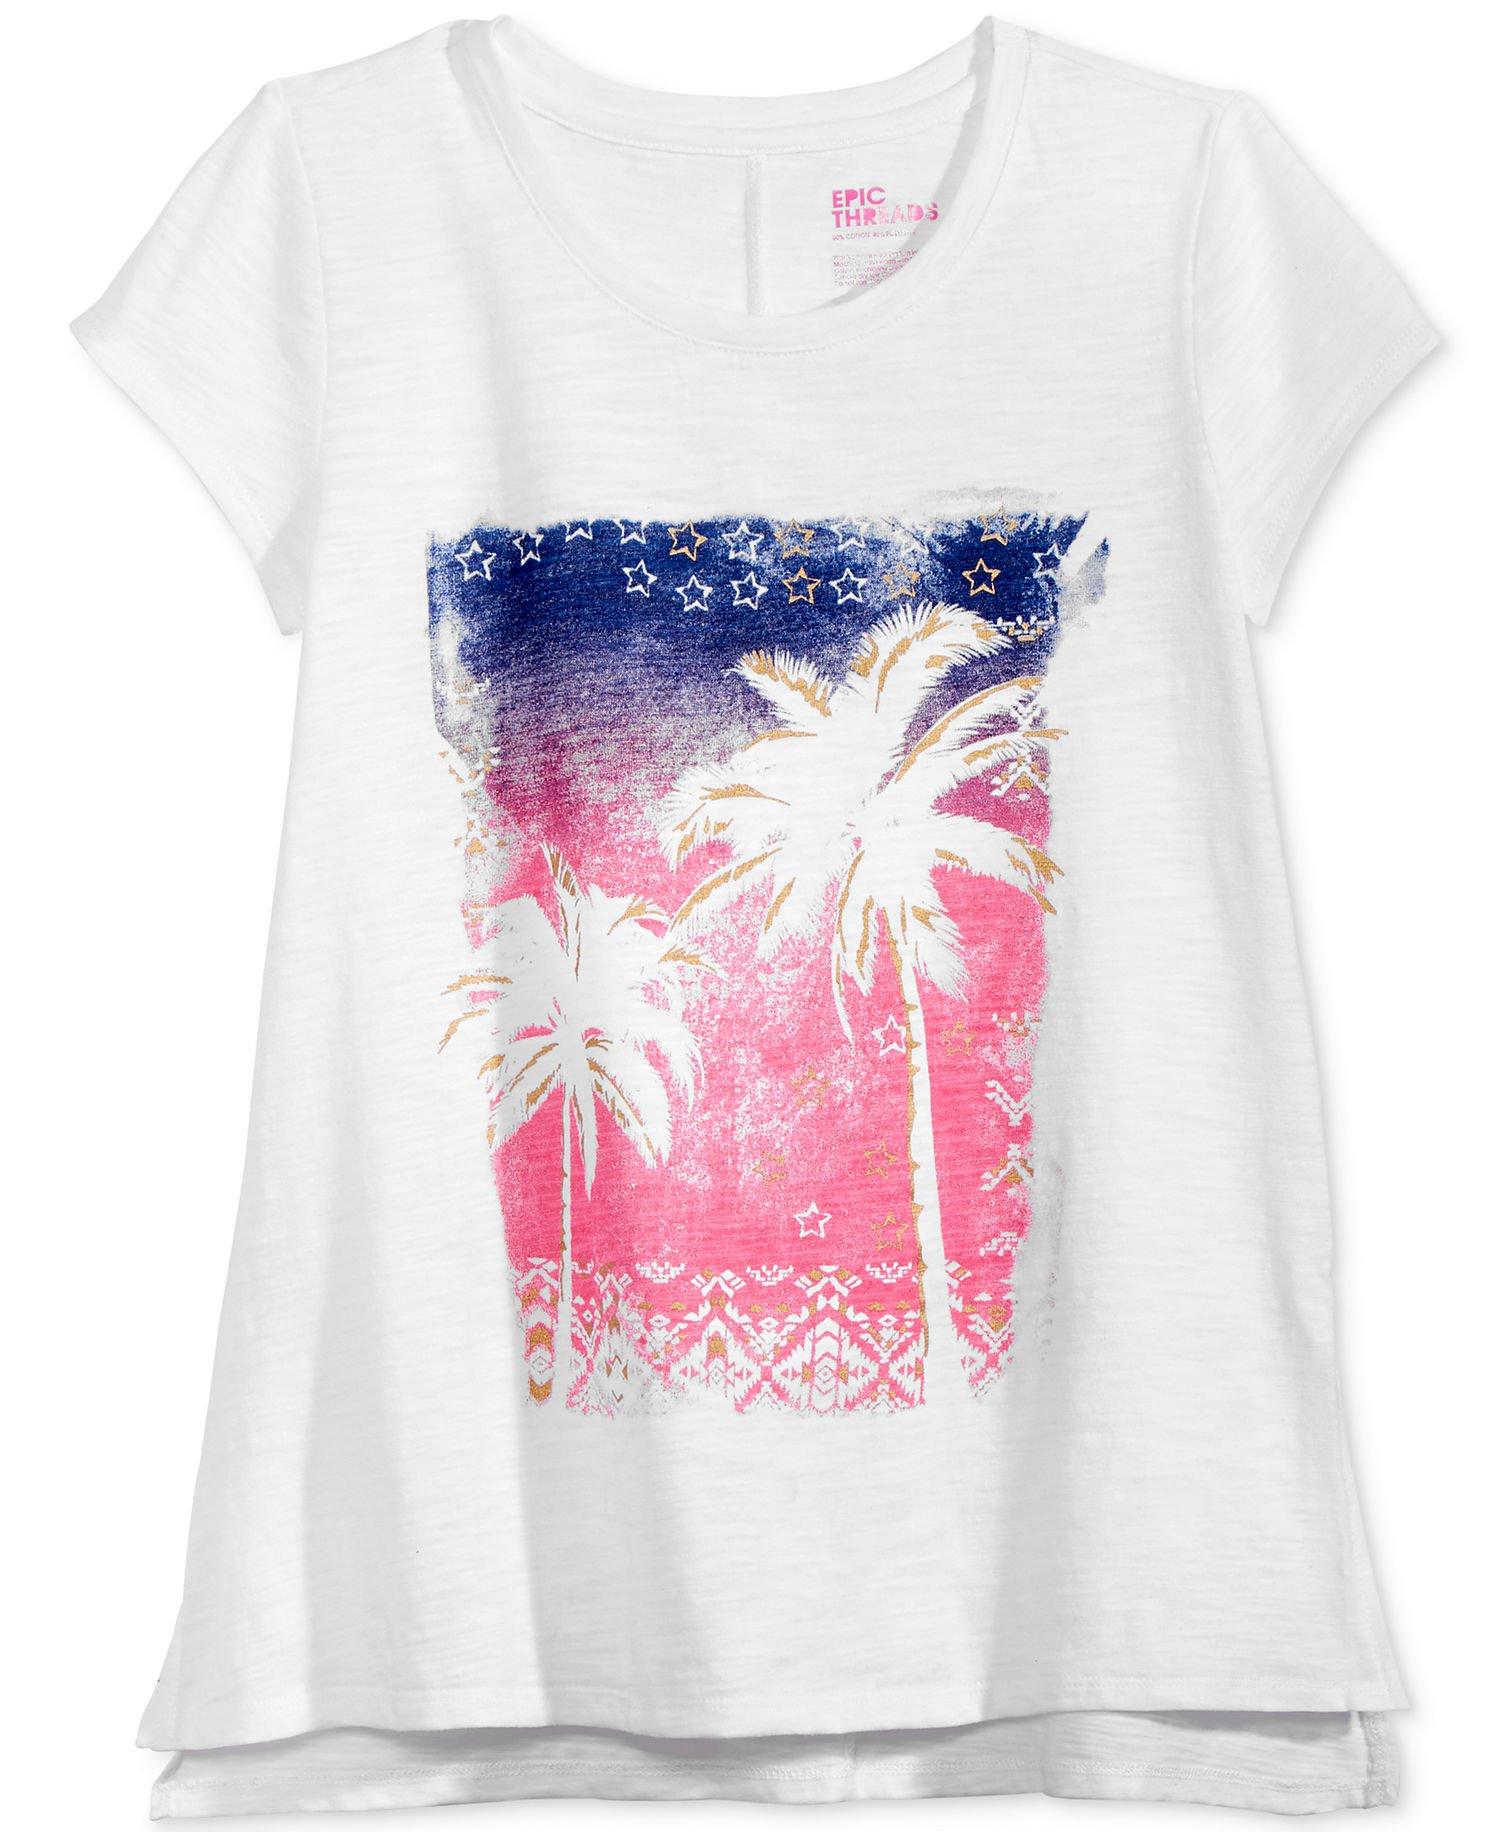 Epic Threads Big Girls' (7-16) Metallic Graphic-Print T-Shirt Bright White Medium